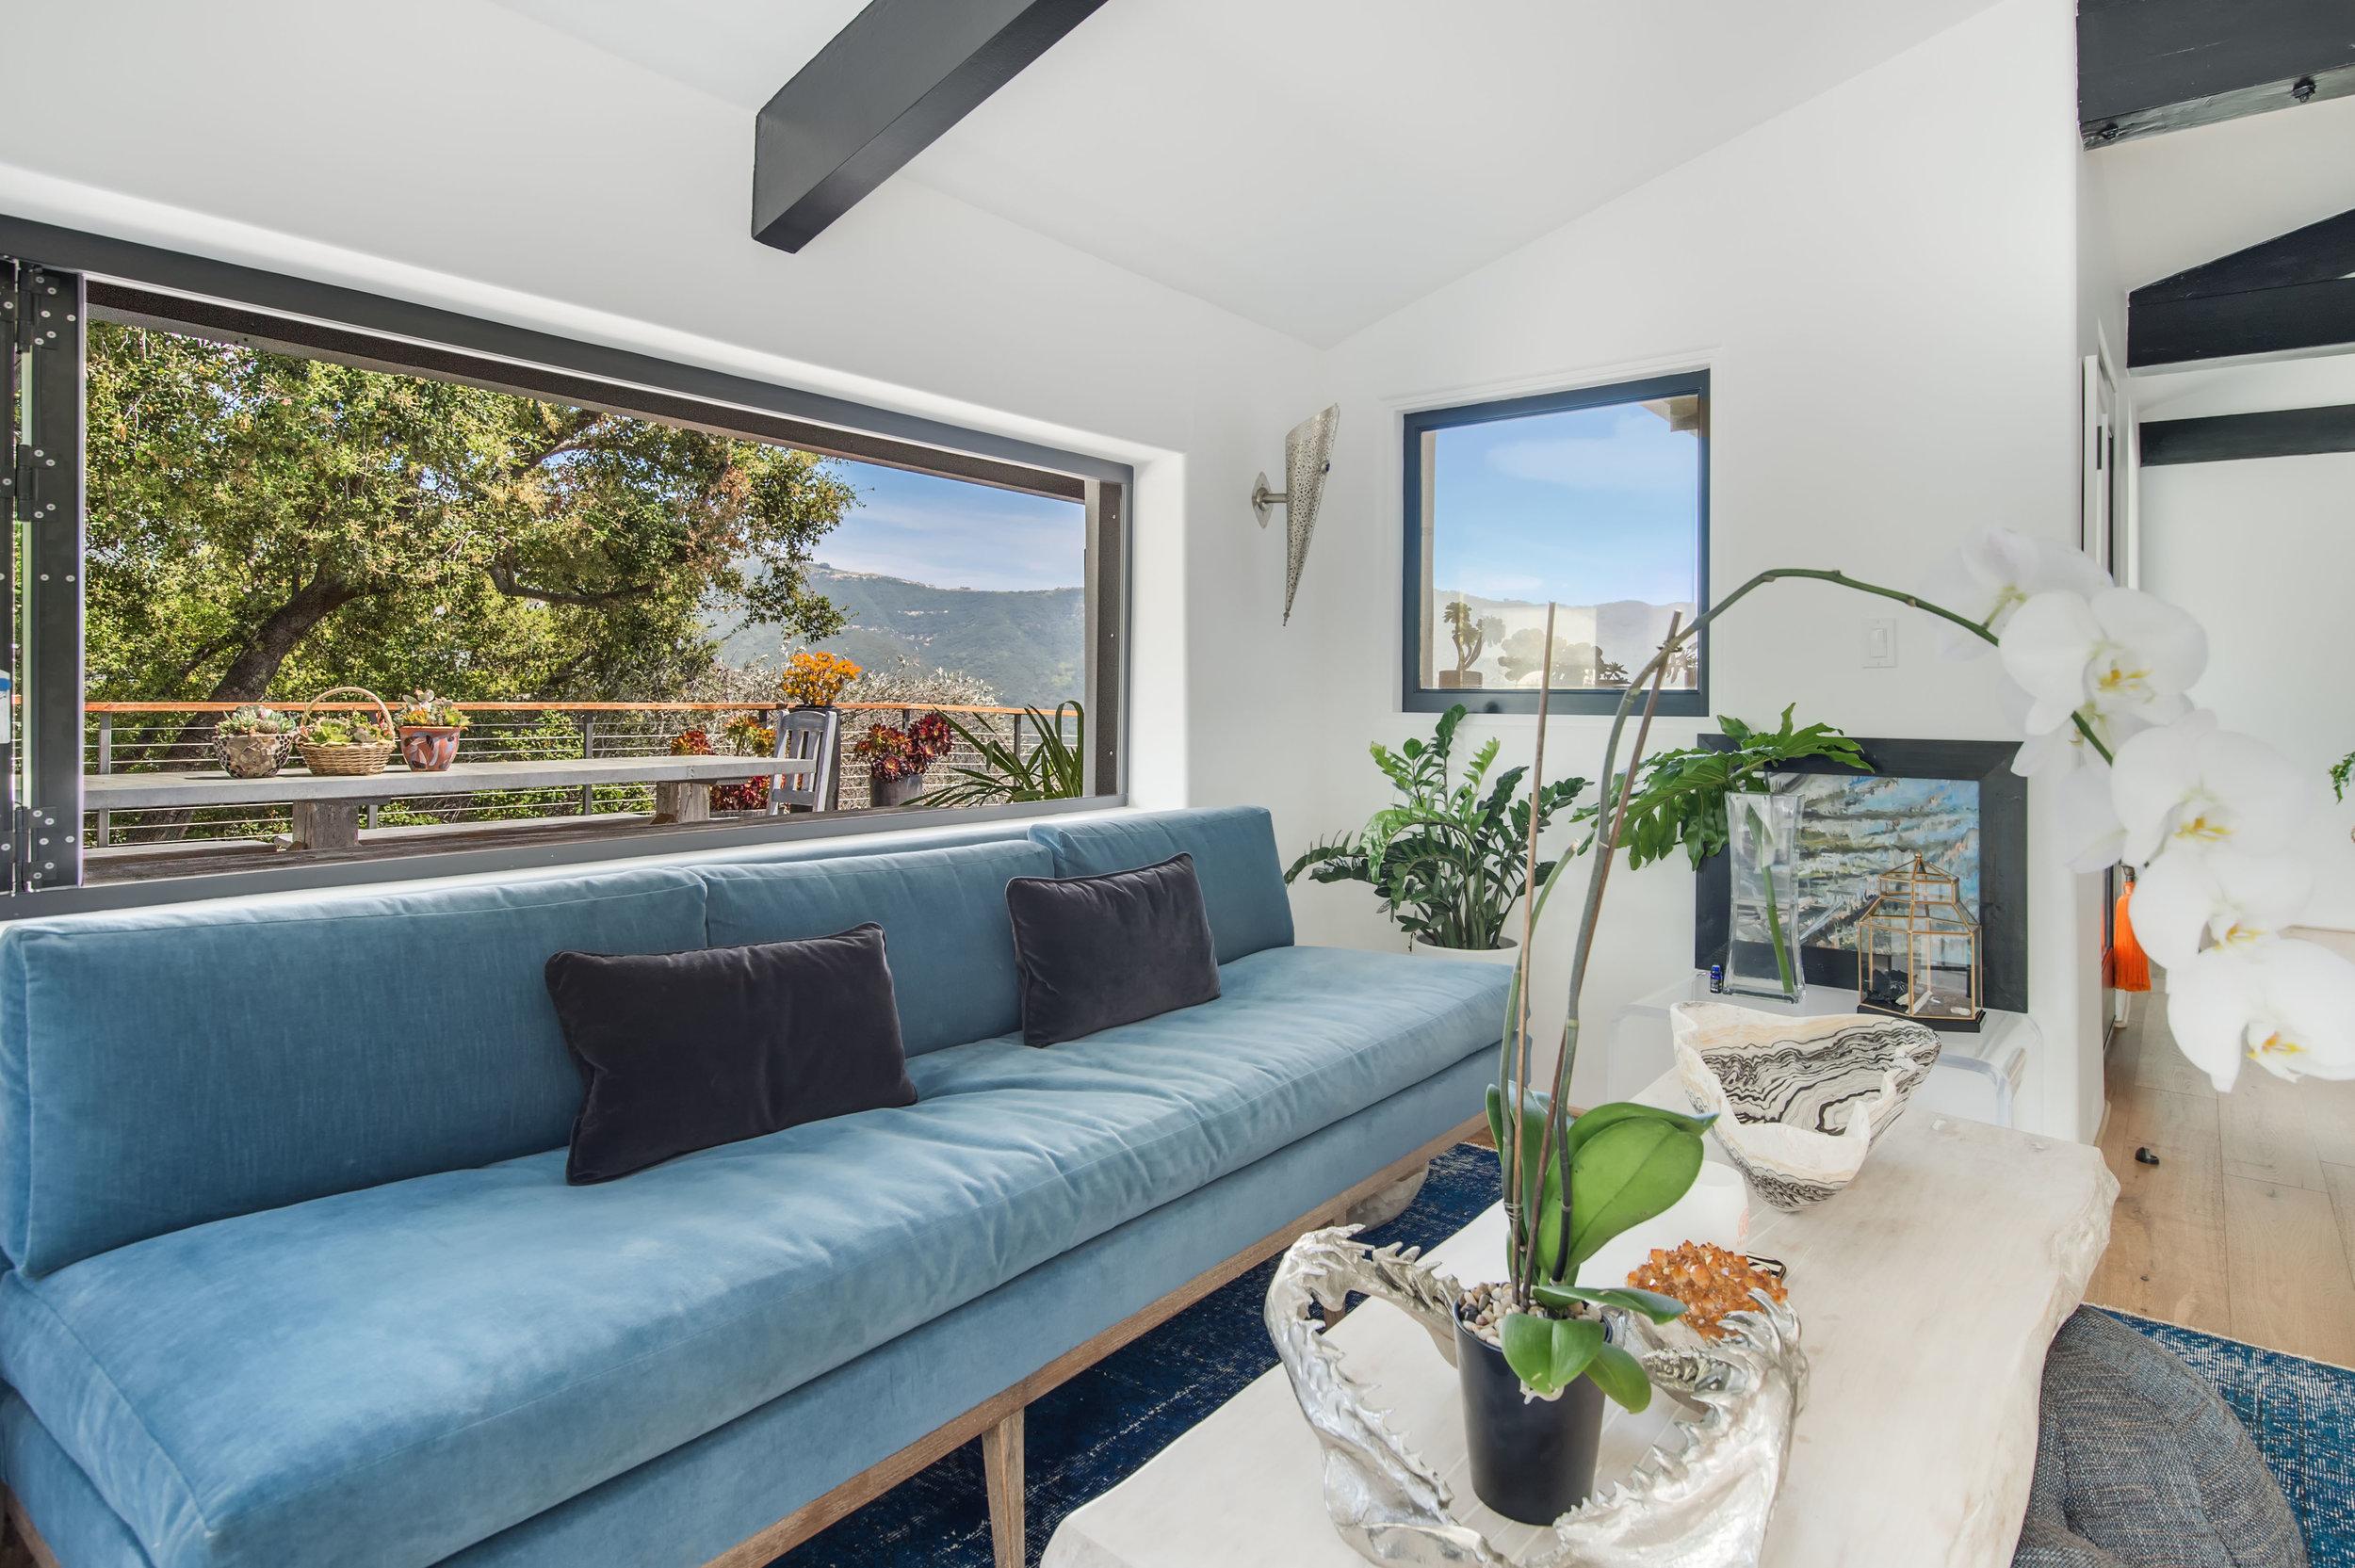 014 Living Room 26272 Cool Glen Way Malibu For Sale Luxury Real Estate.jpg